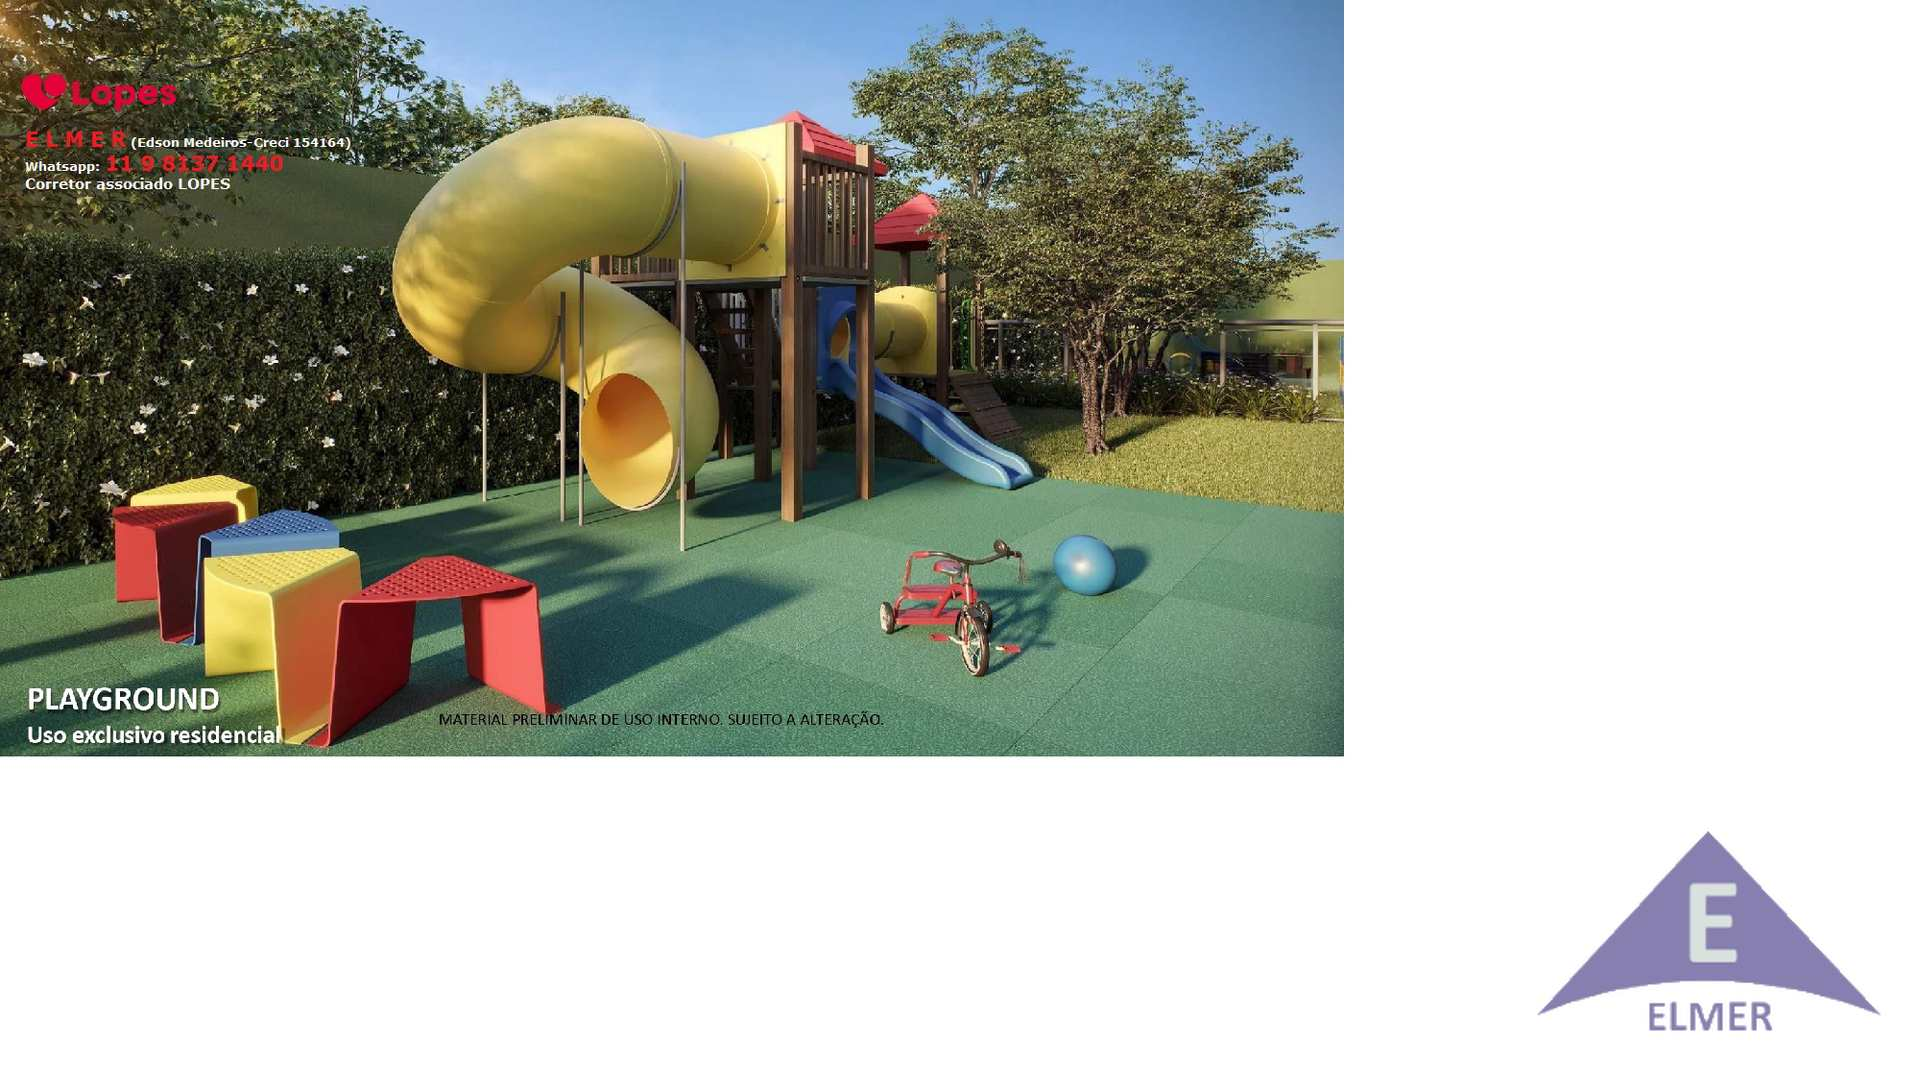 8 - Playground - Haus Mitre -Campo-Belo - Elmer